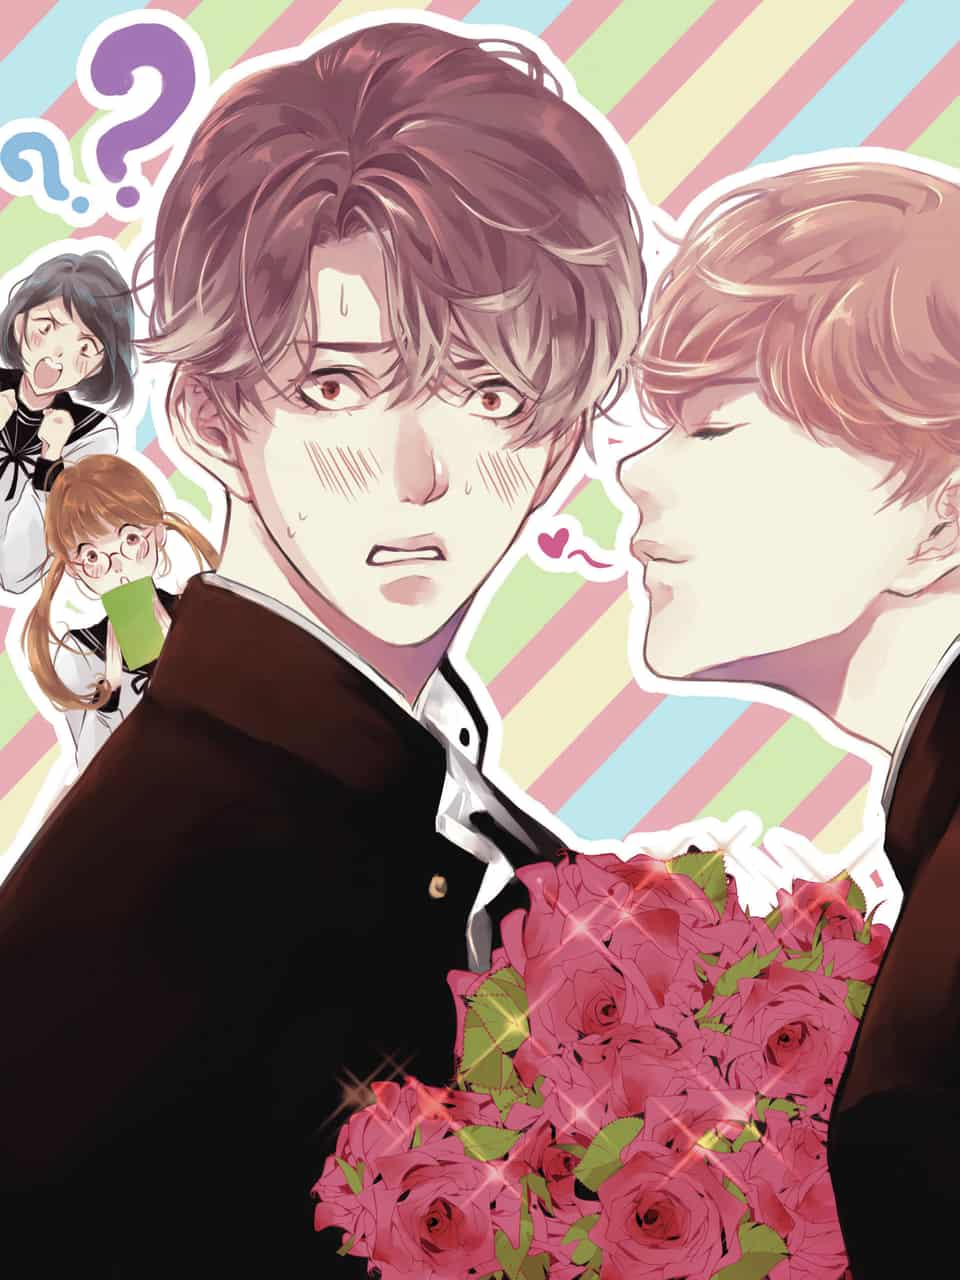 The Troubled Boys and Sweet Heart Illust of Lita Orenji GOMABOOKS_Contest Boys medibangpaint Gakuran love Coverbook